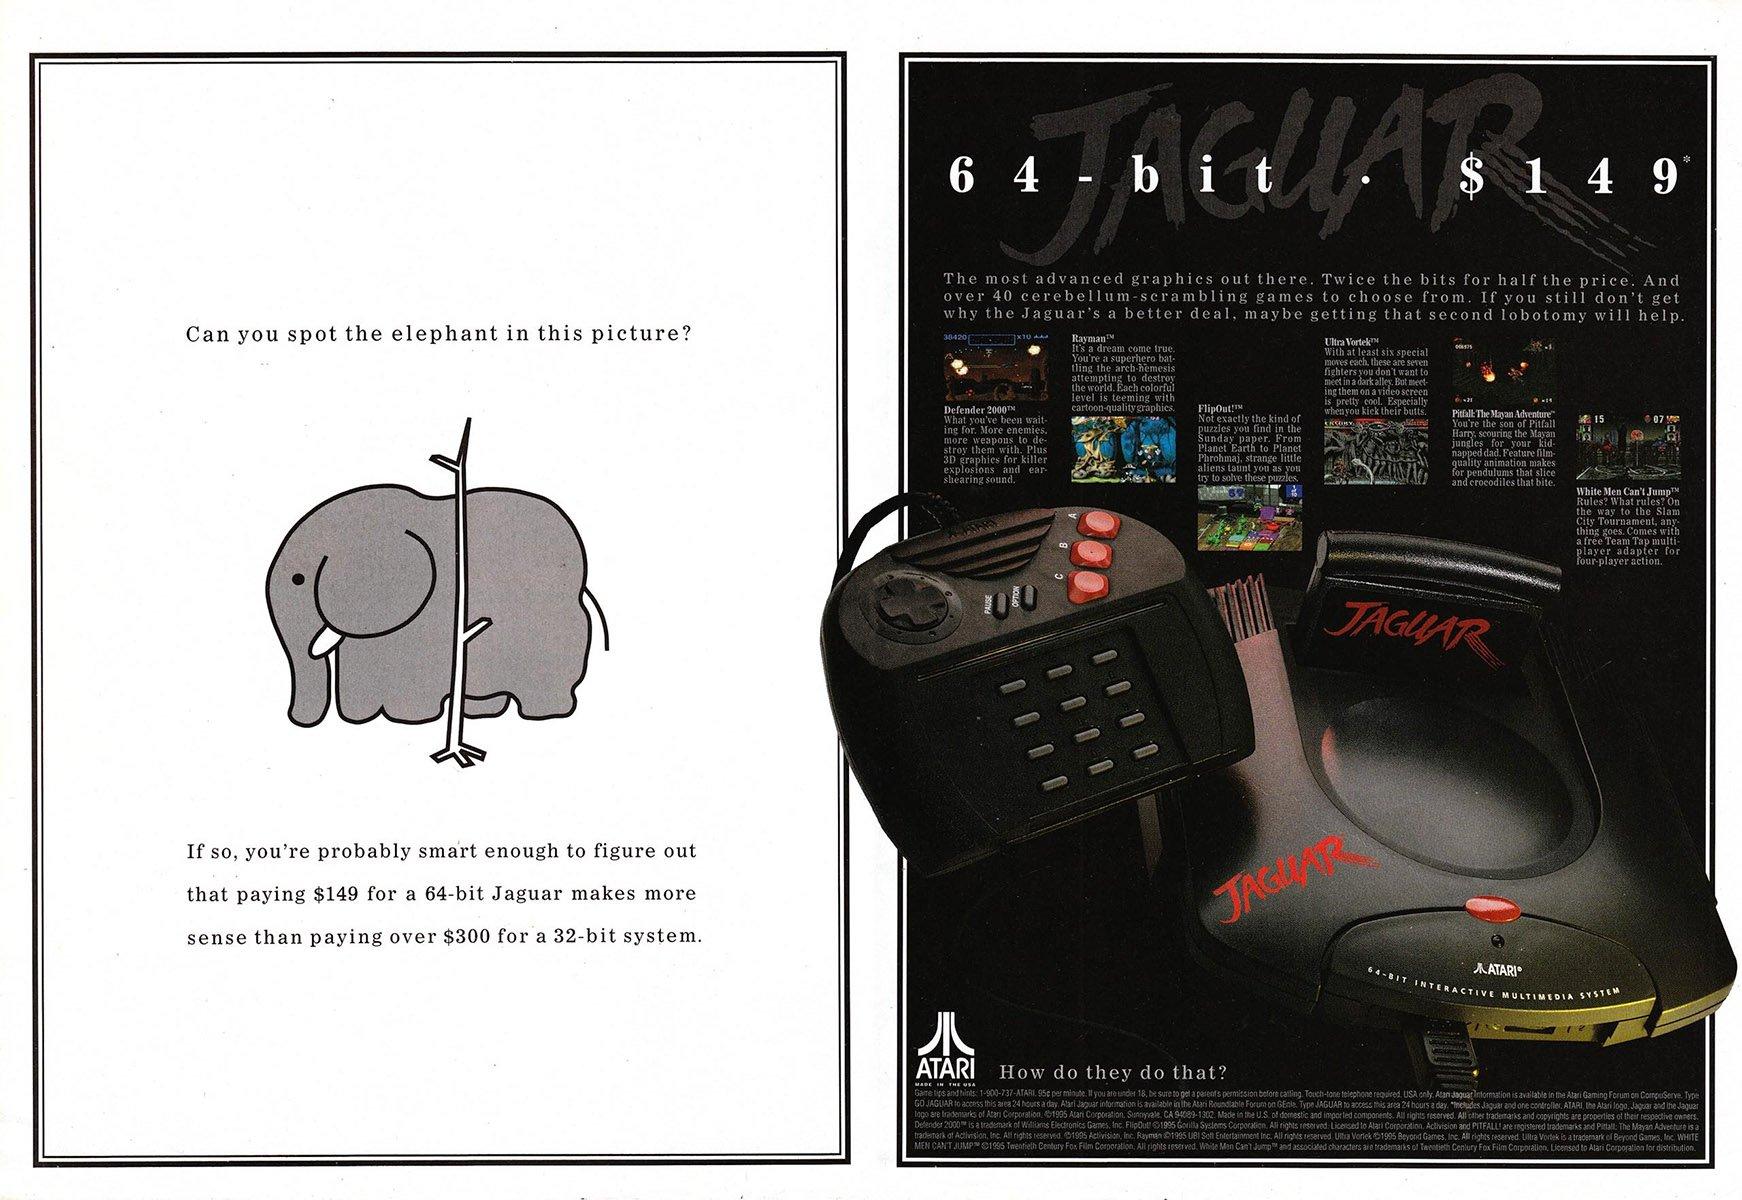 Atari Jaguar $149 price drop October 1995 (2)